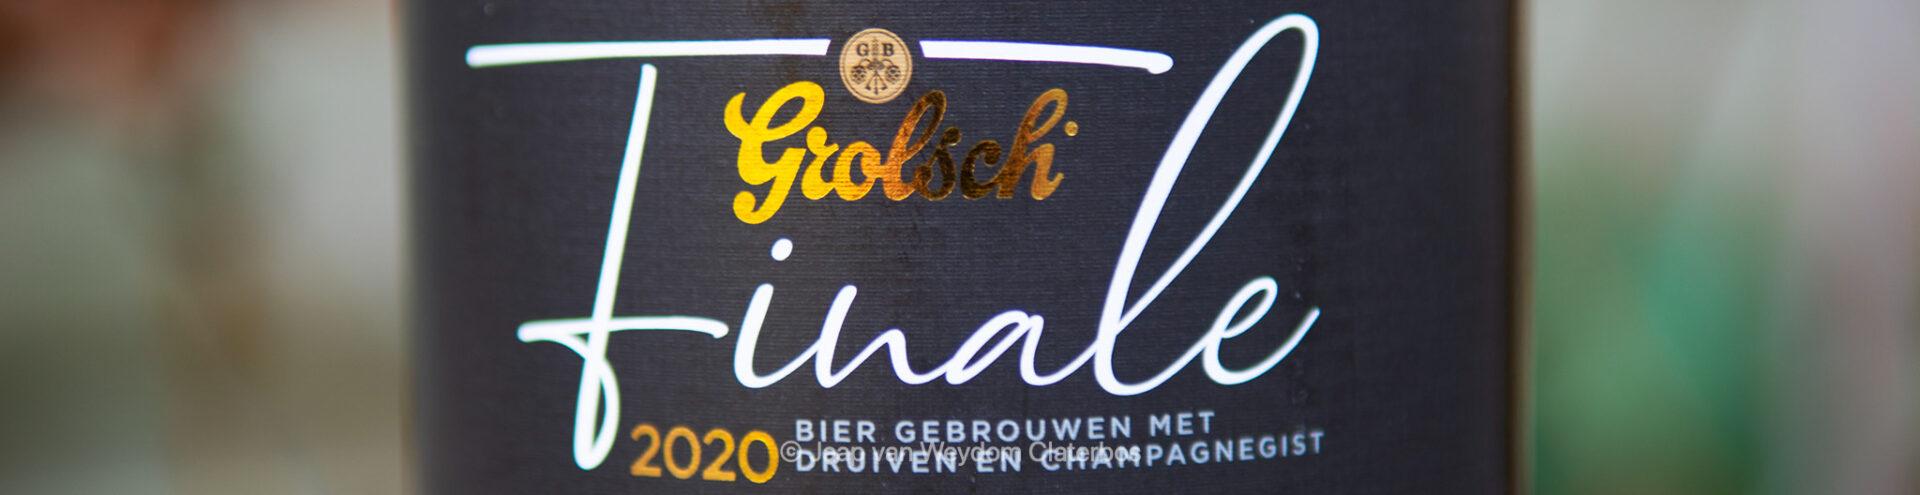 Grolsch Finale 2020